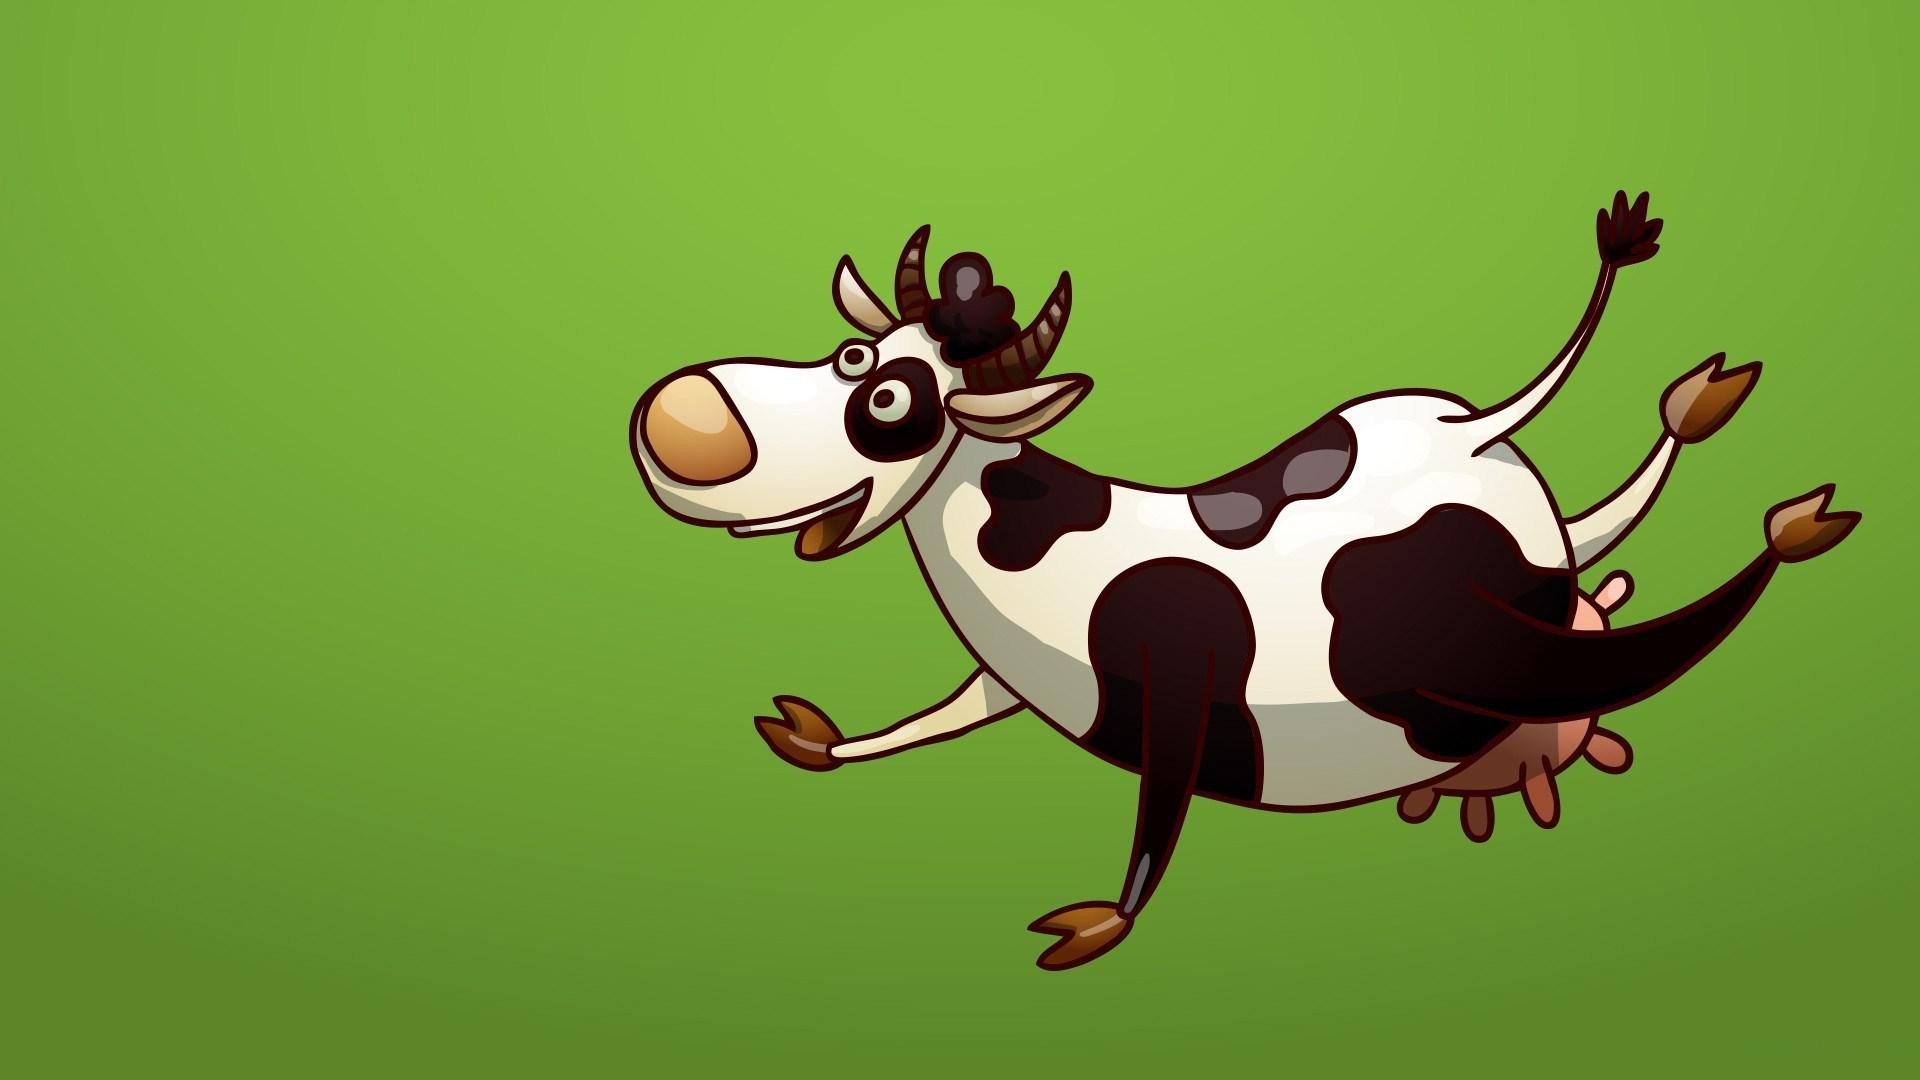 Cute Panda Iphone Wallpapers Funny 3d Cartoon Backgrounds Download Free Pixelstalk Net